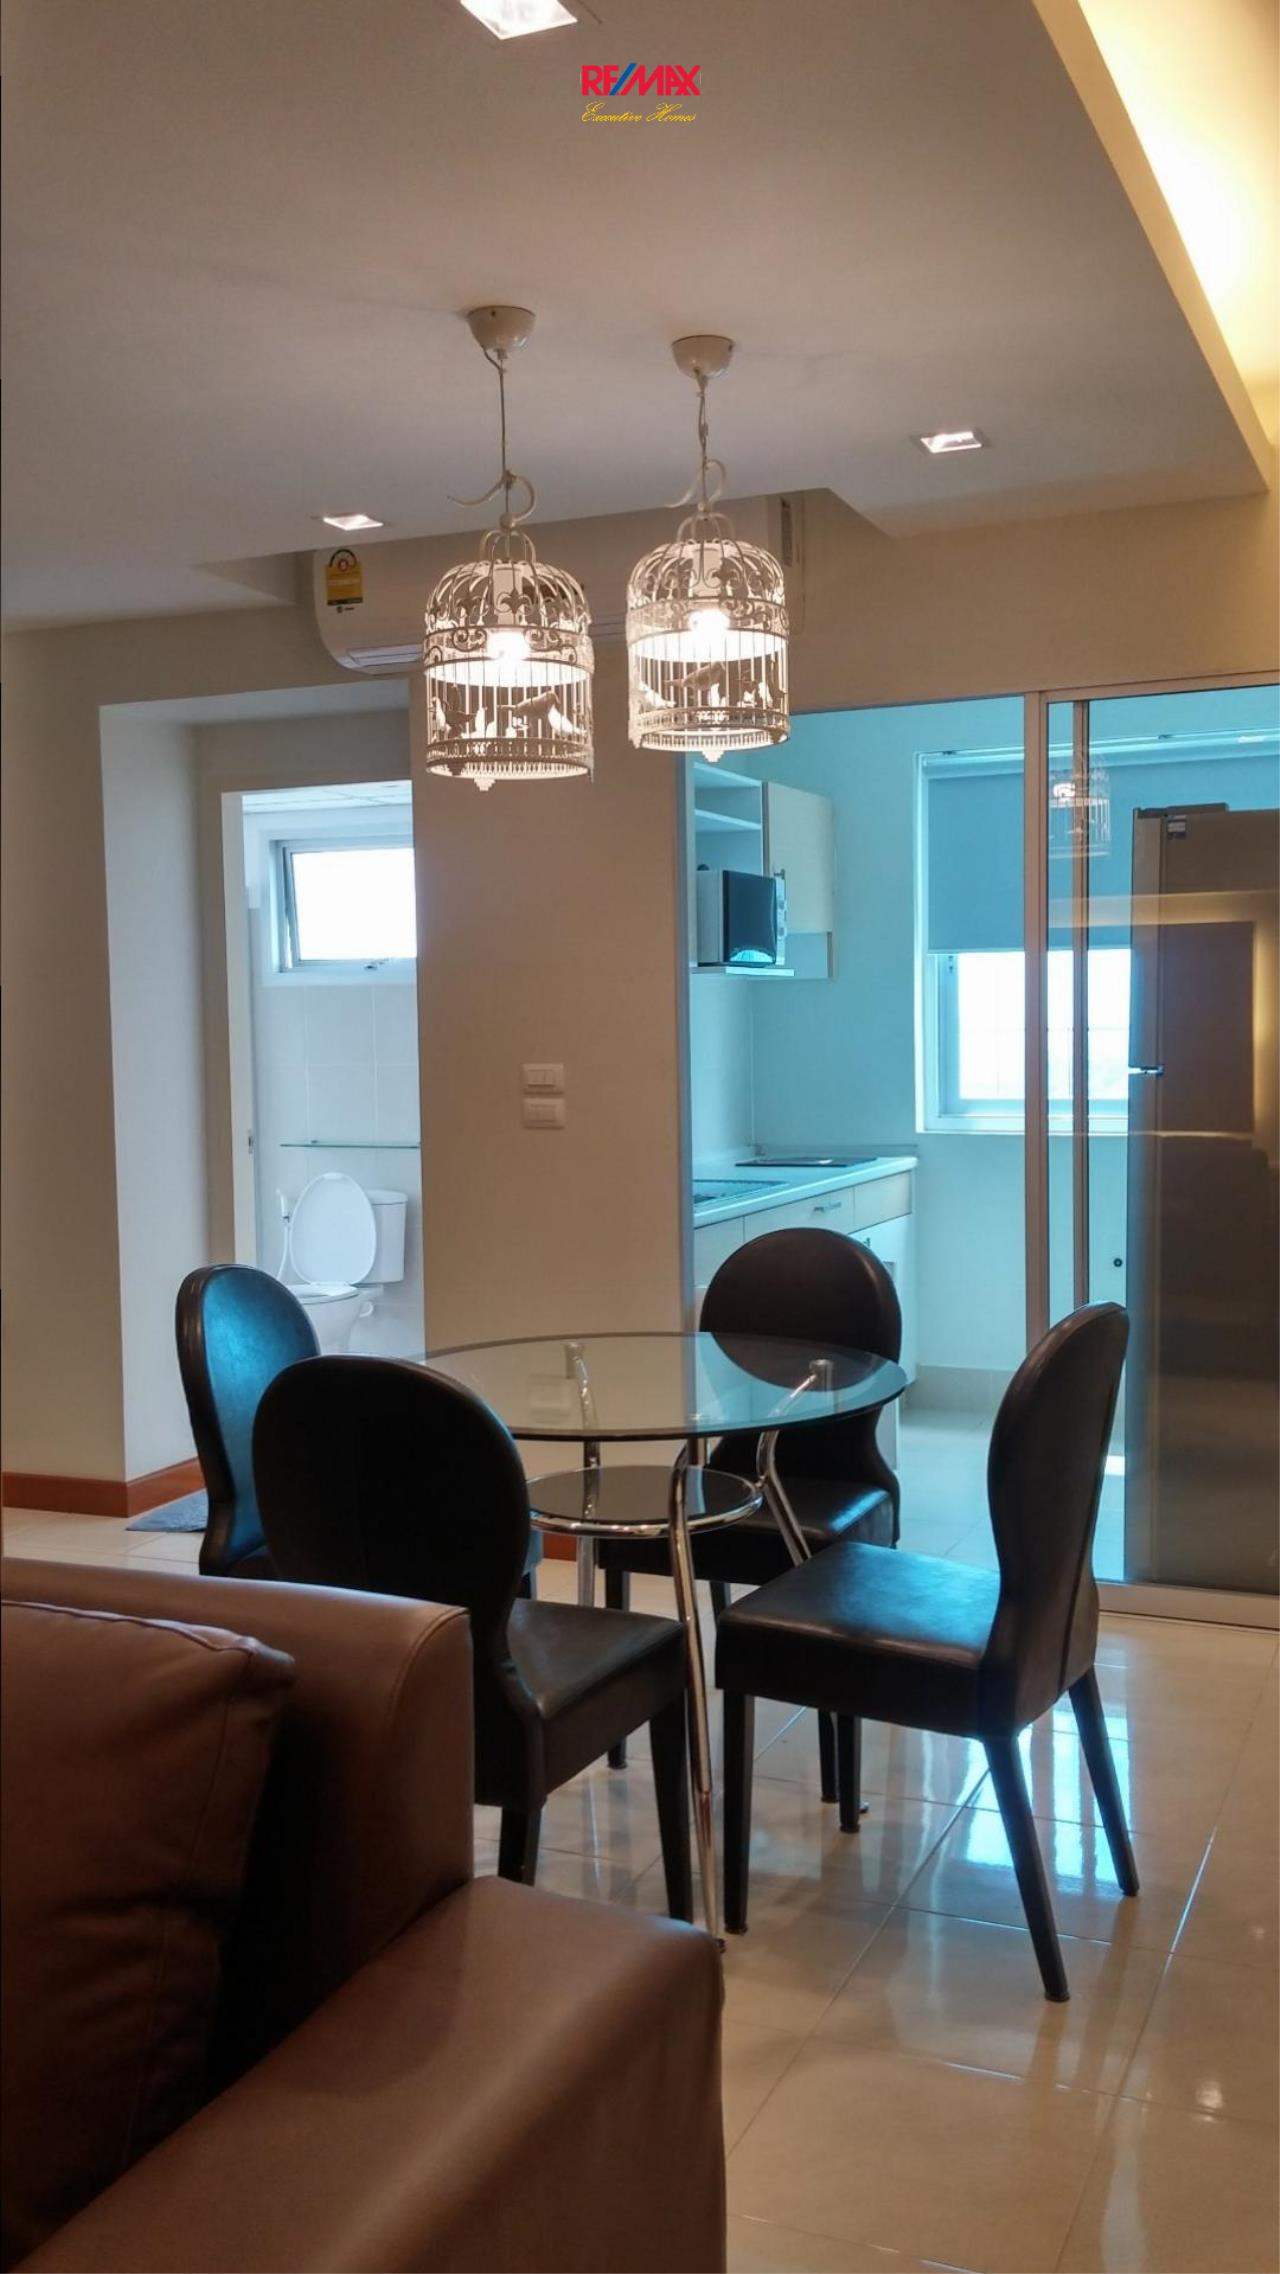 RE/MAX Executive Homes Agency's Nice 2 Bedroom for Rent Supalai Park Ekamai Thonglor 1